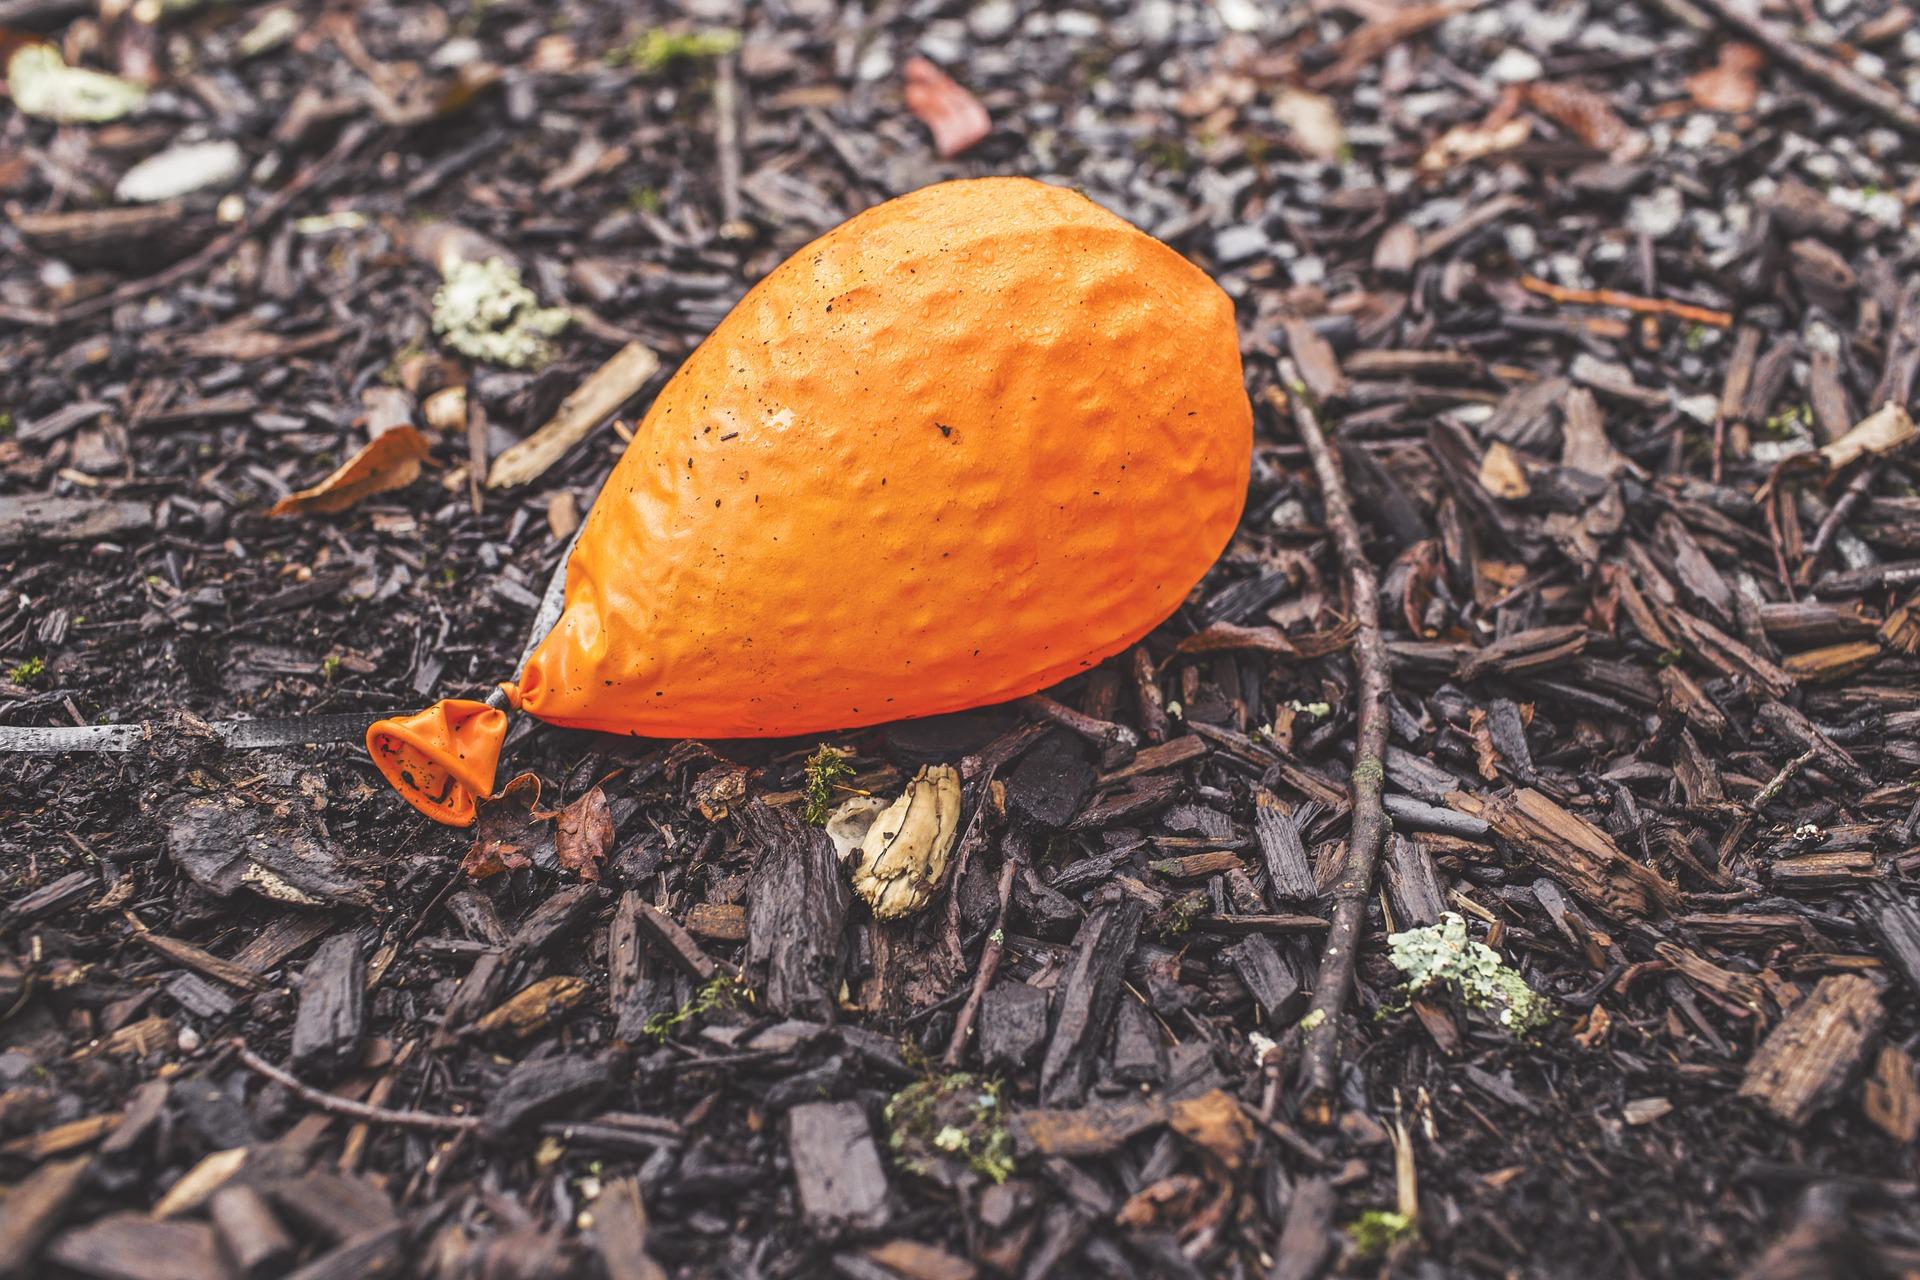 orange-698534_1920.jpg